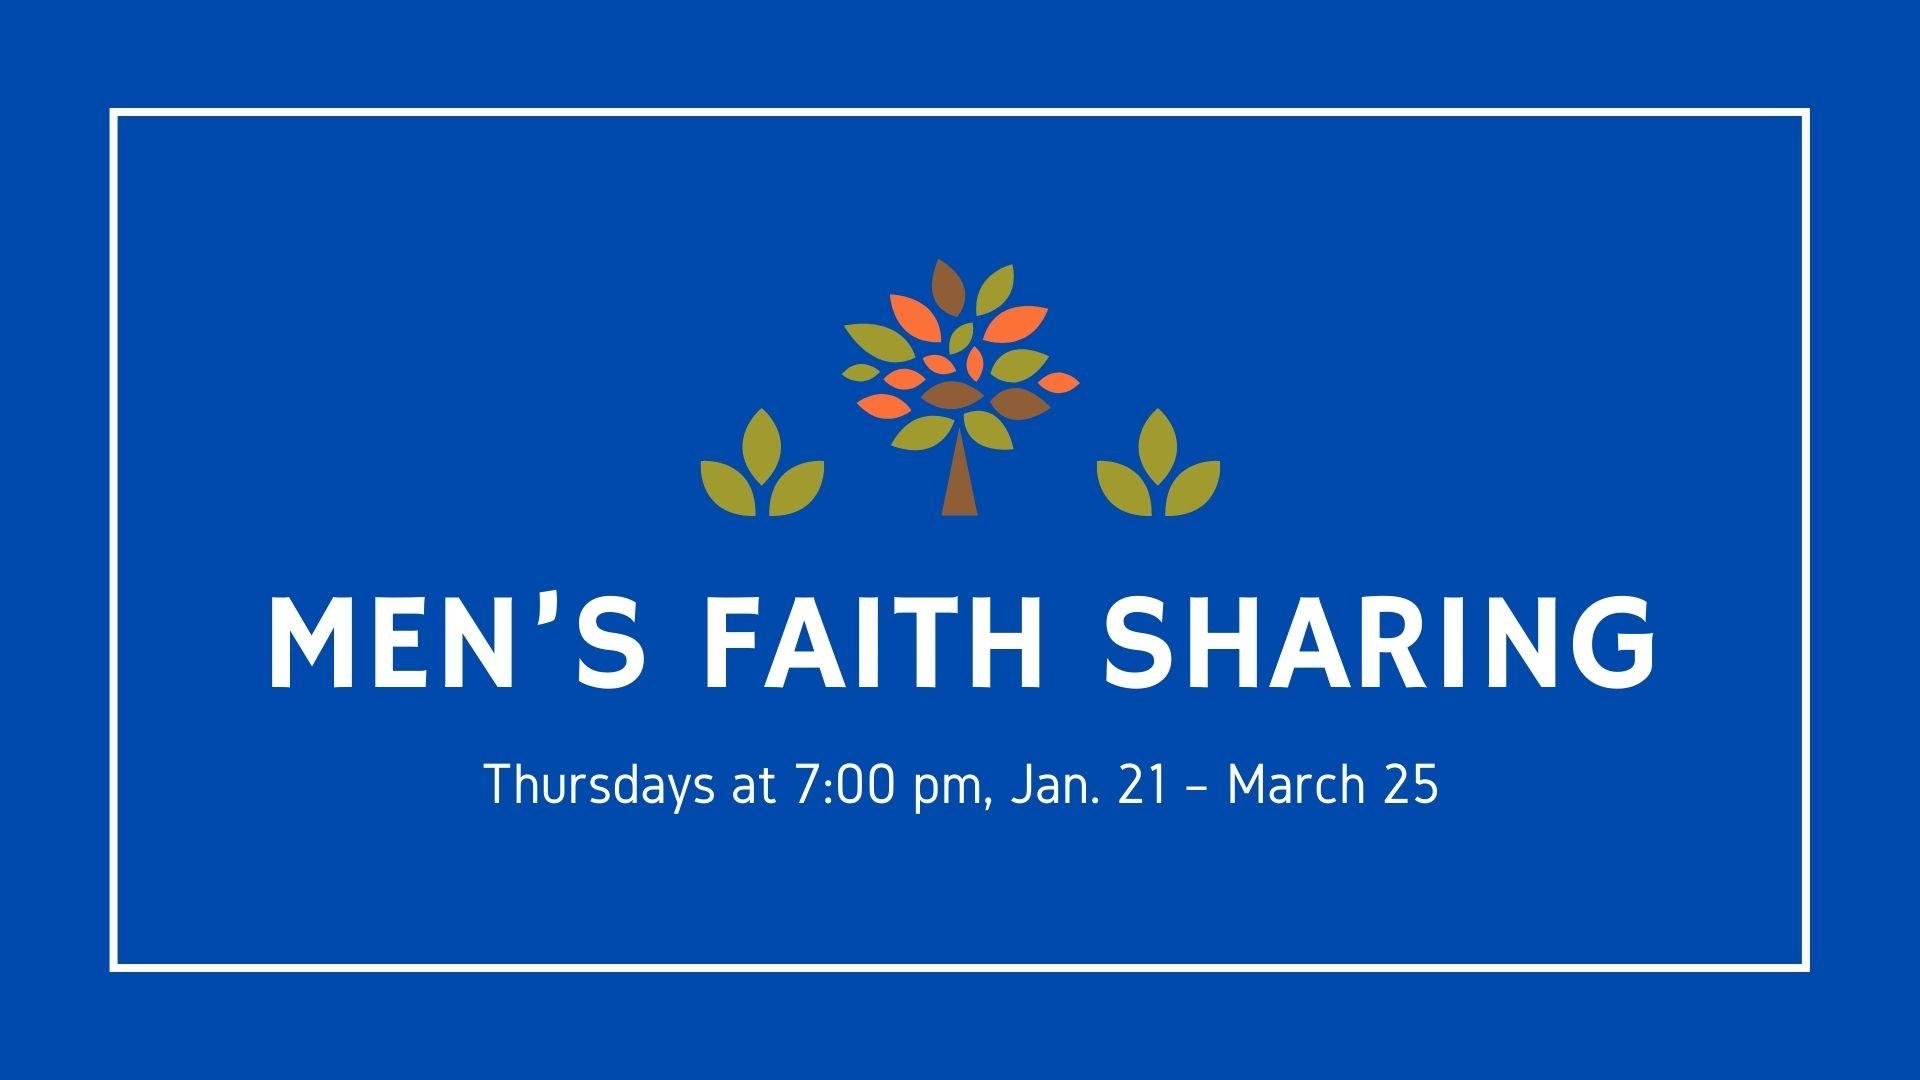 Men's Faith Sharing